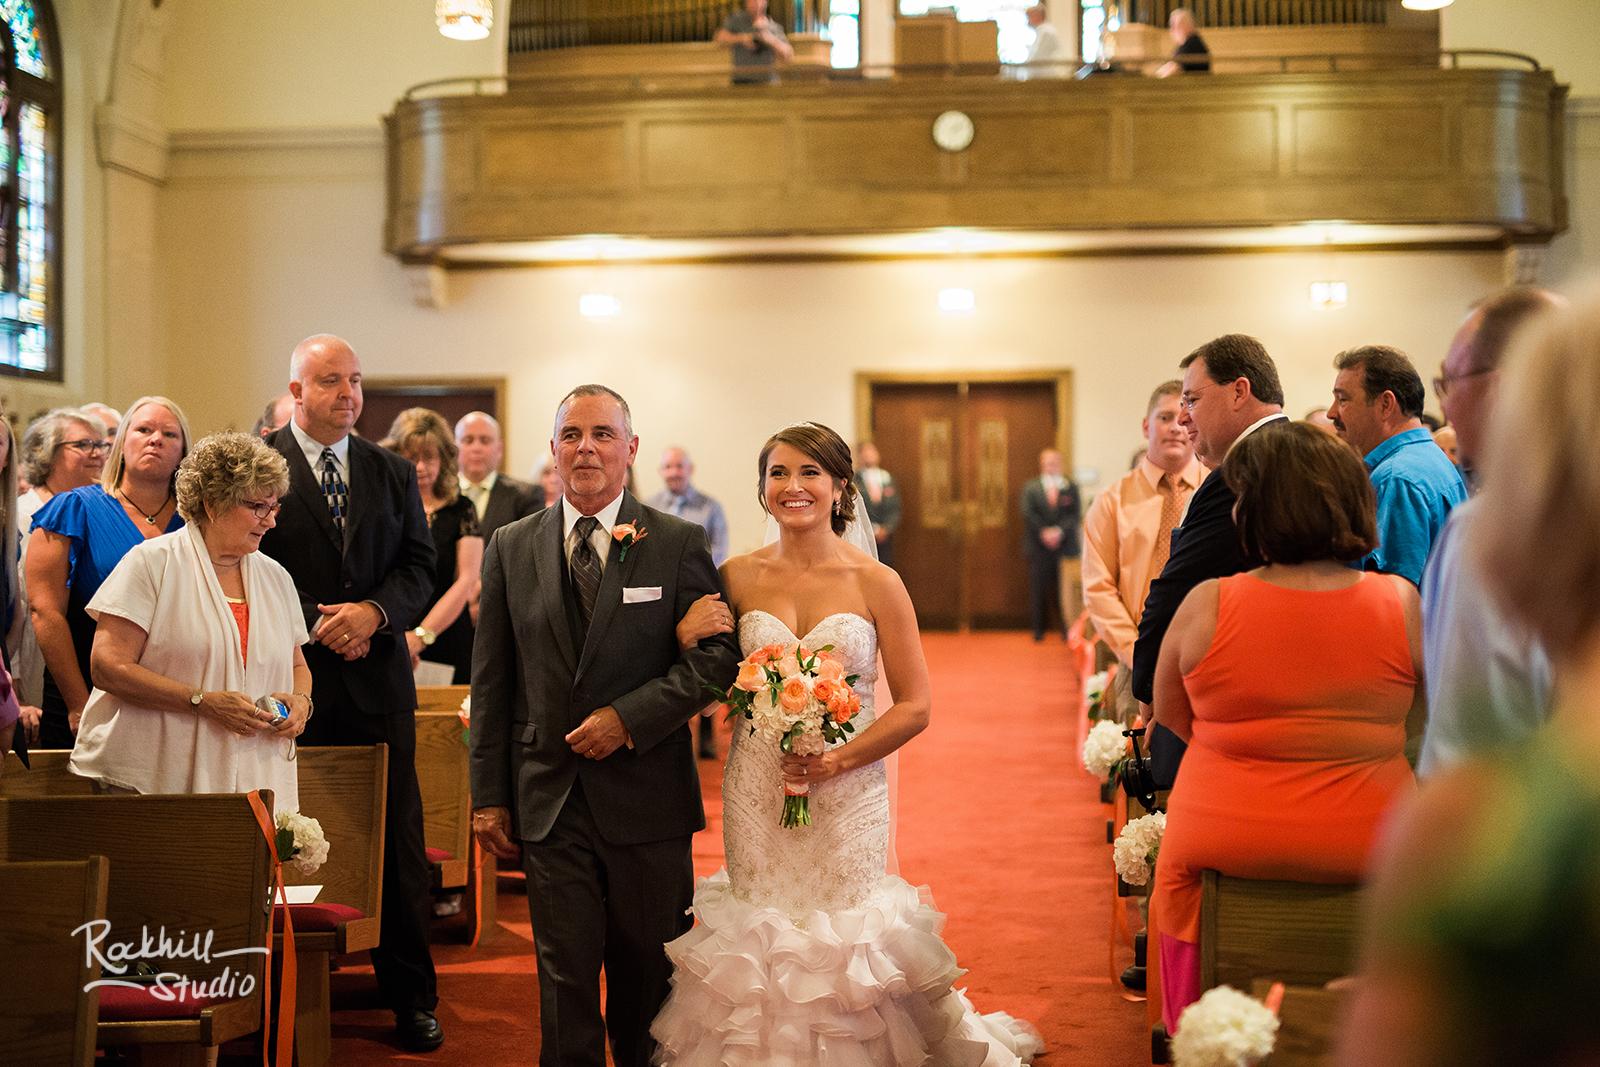 marquette-wedding-upper-peninsula-northern-michigan-wedding-ck-photography-wedding-party-6.jpg